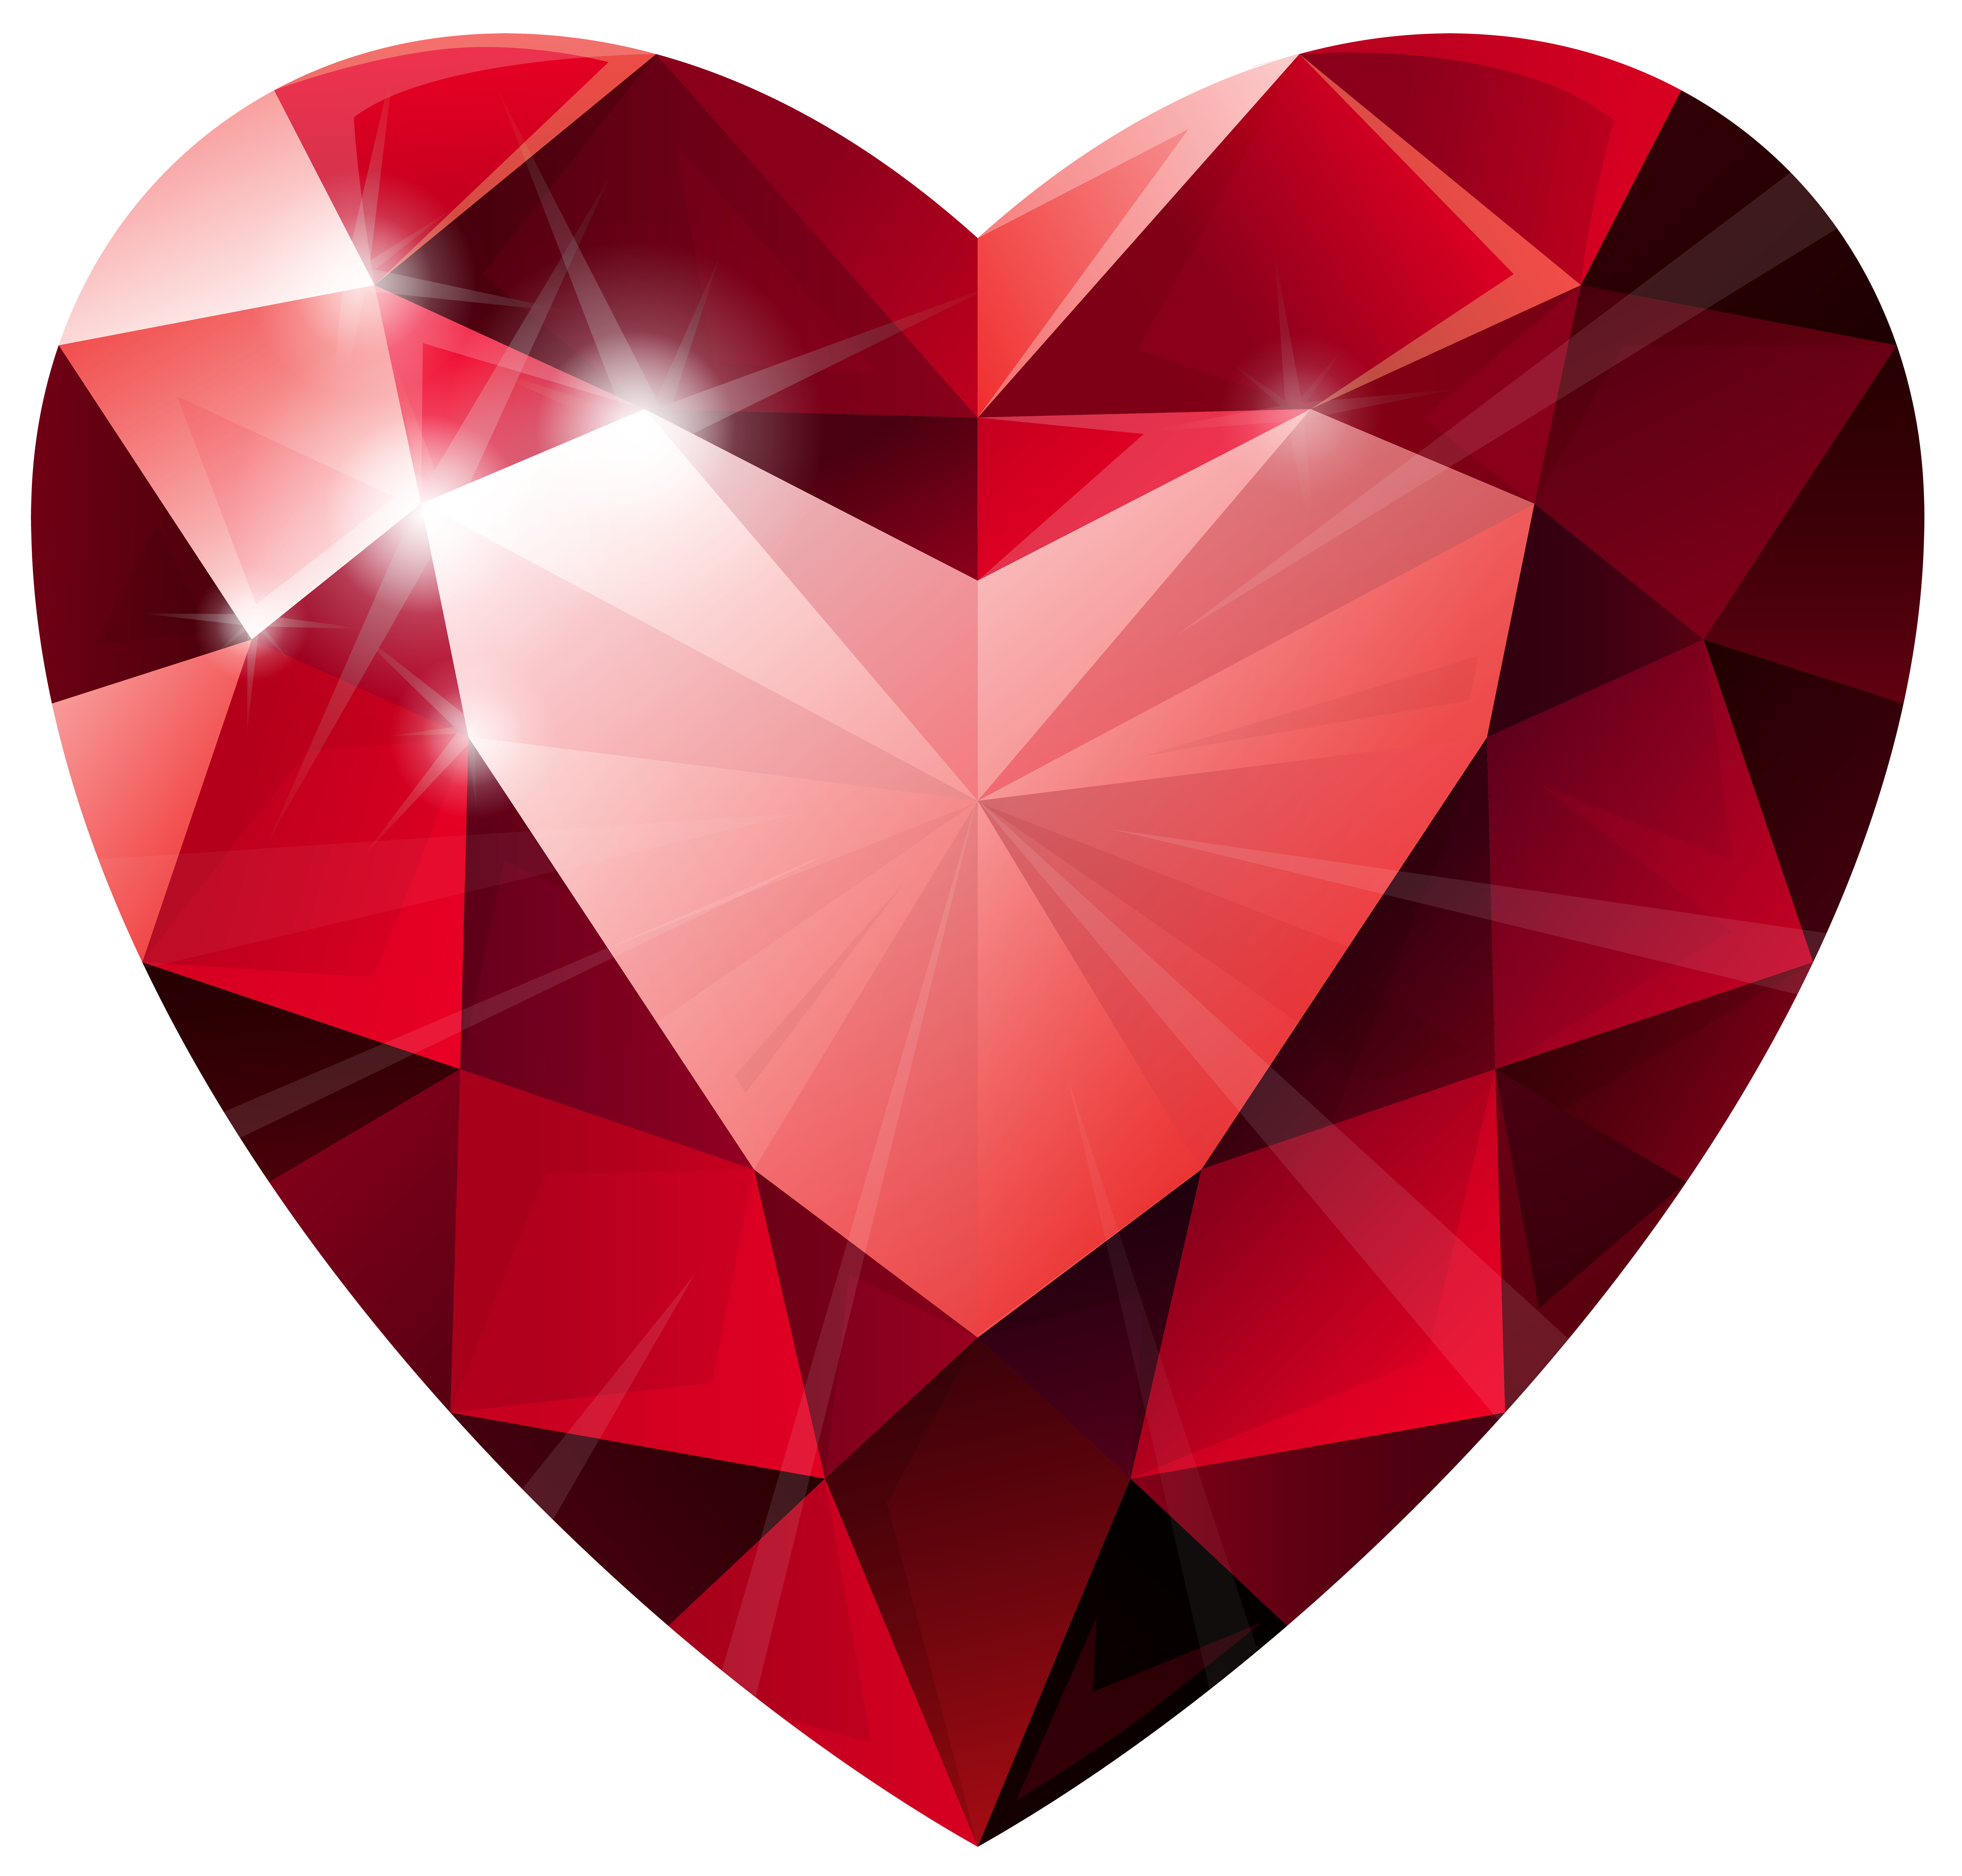 Diamond Heart Transparent Png Clip Art Image Jewel Drawing Art Images Art